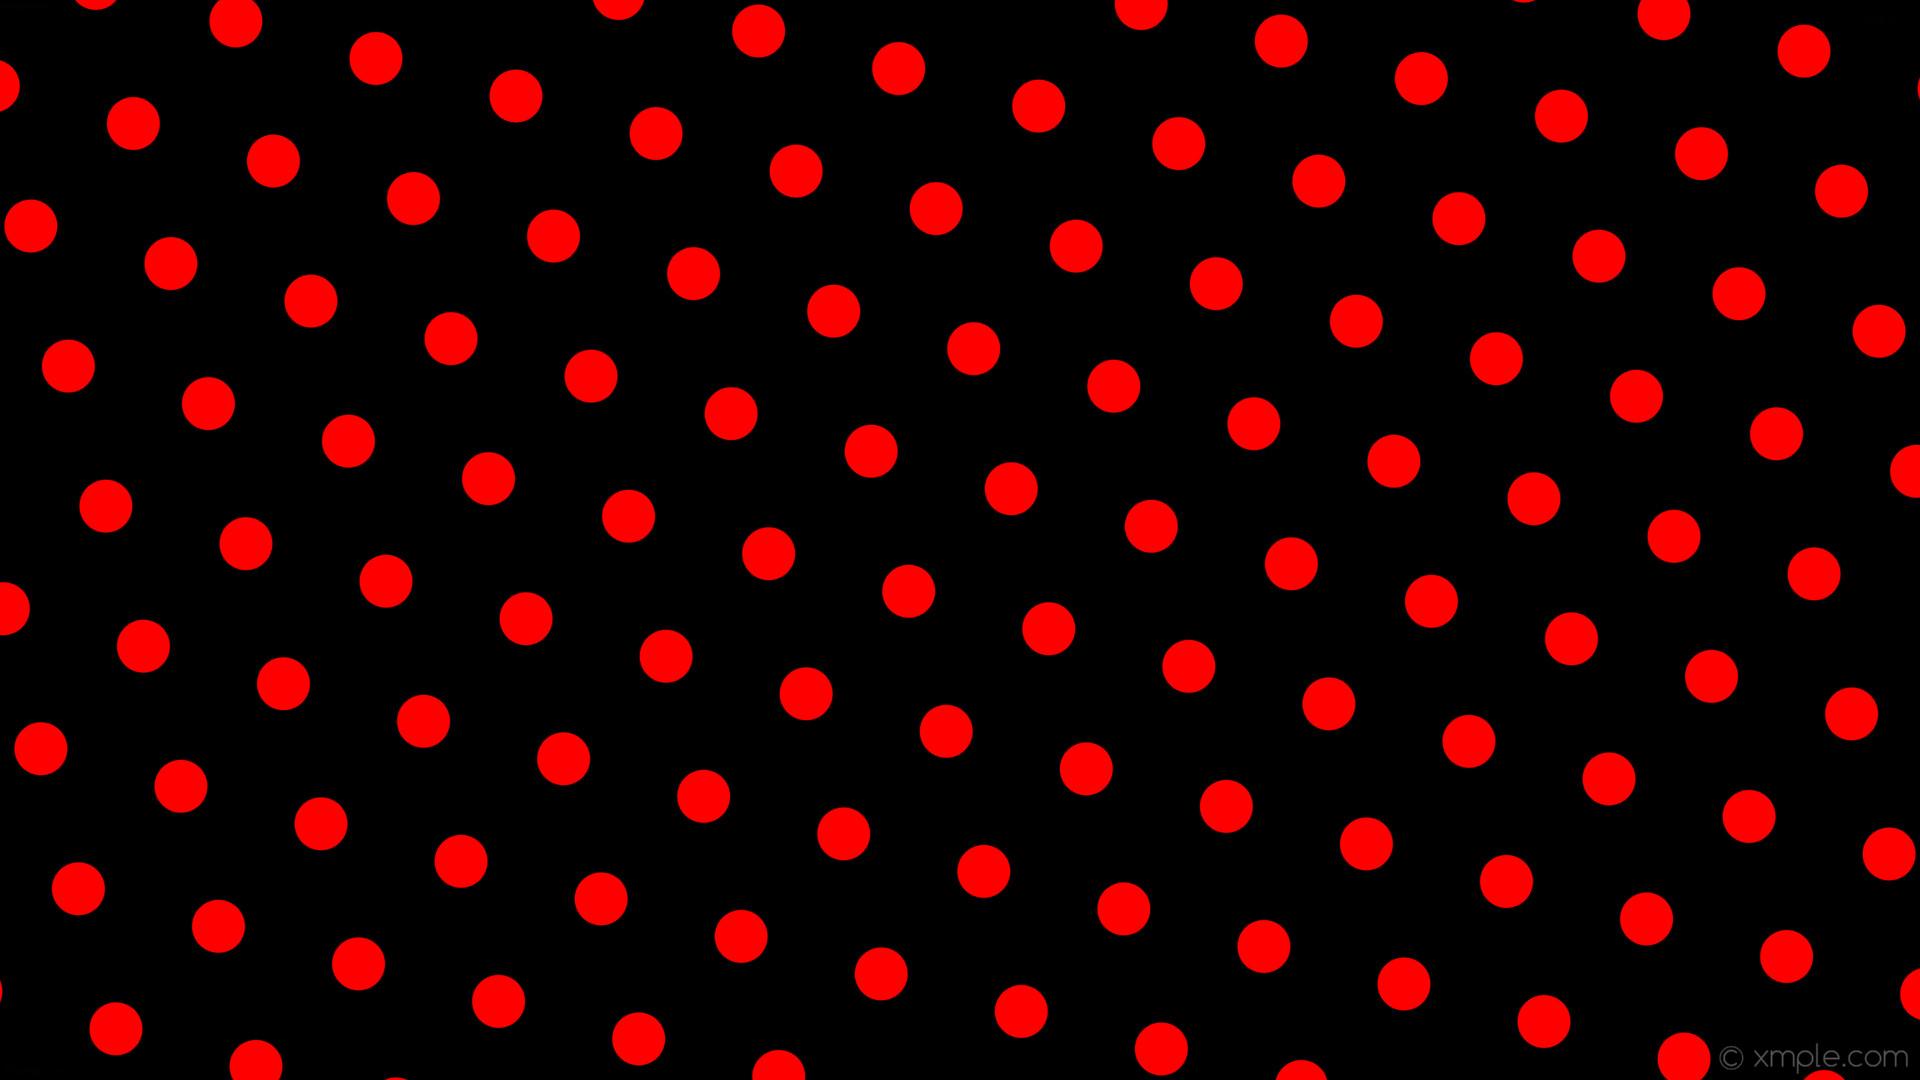 wallpaper hexagon black red polka dots #000000 #ff0000 diagonal 45° 53px  145px